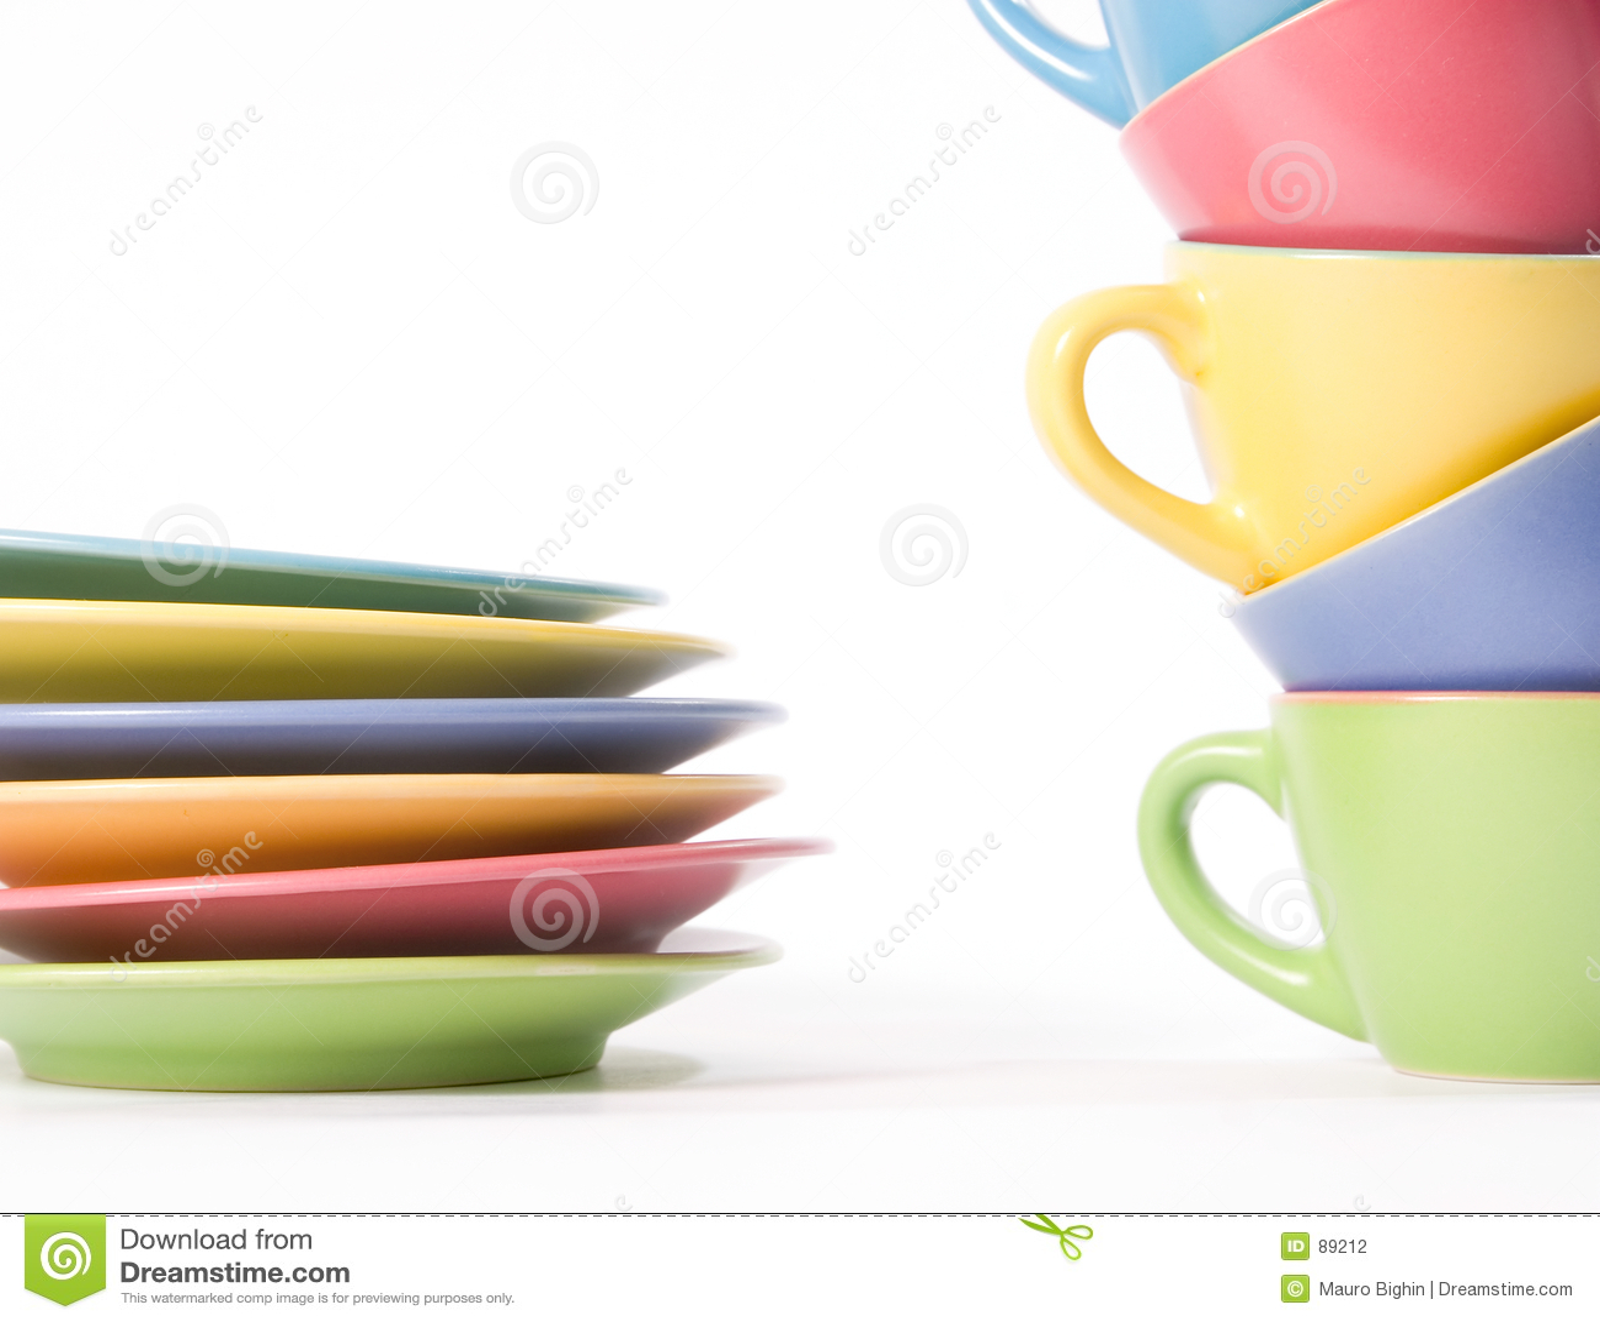 Tazze e piatti di caffè colorati